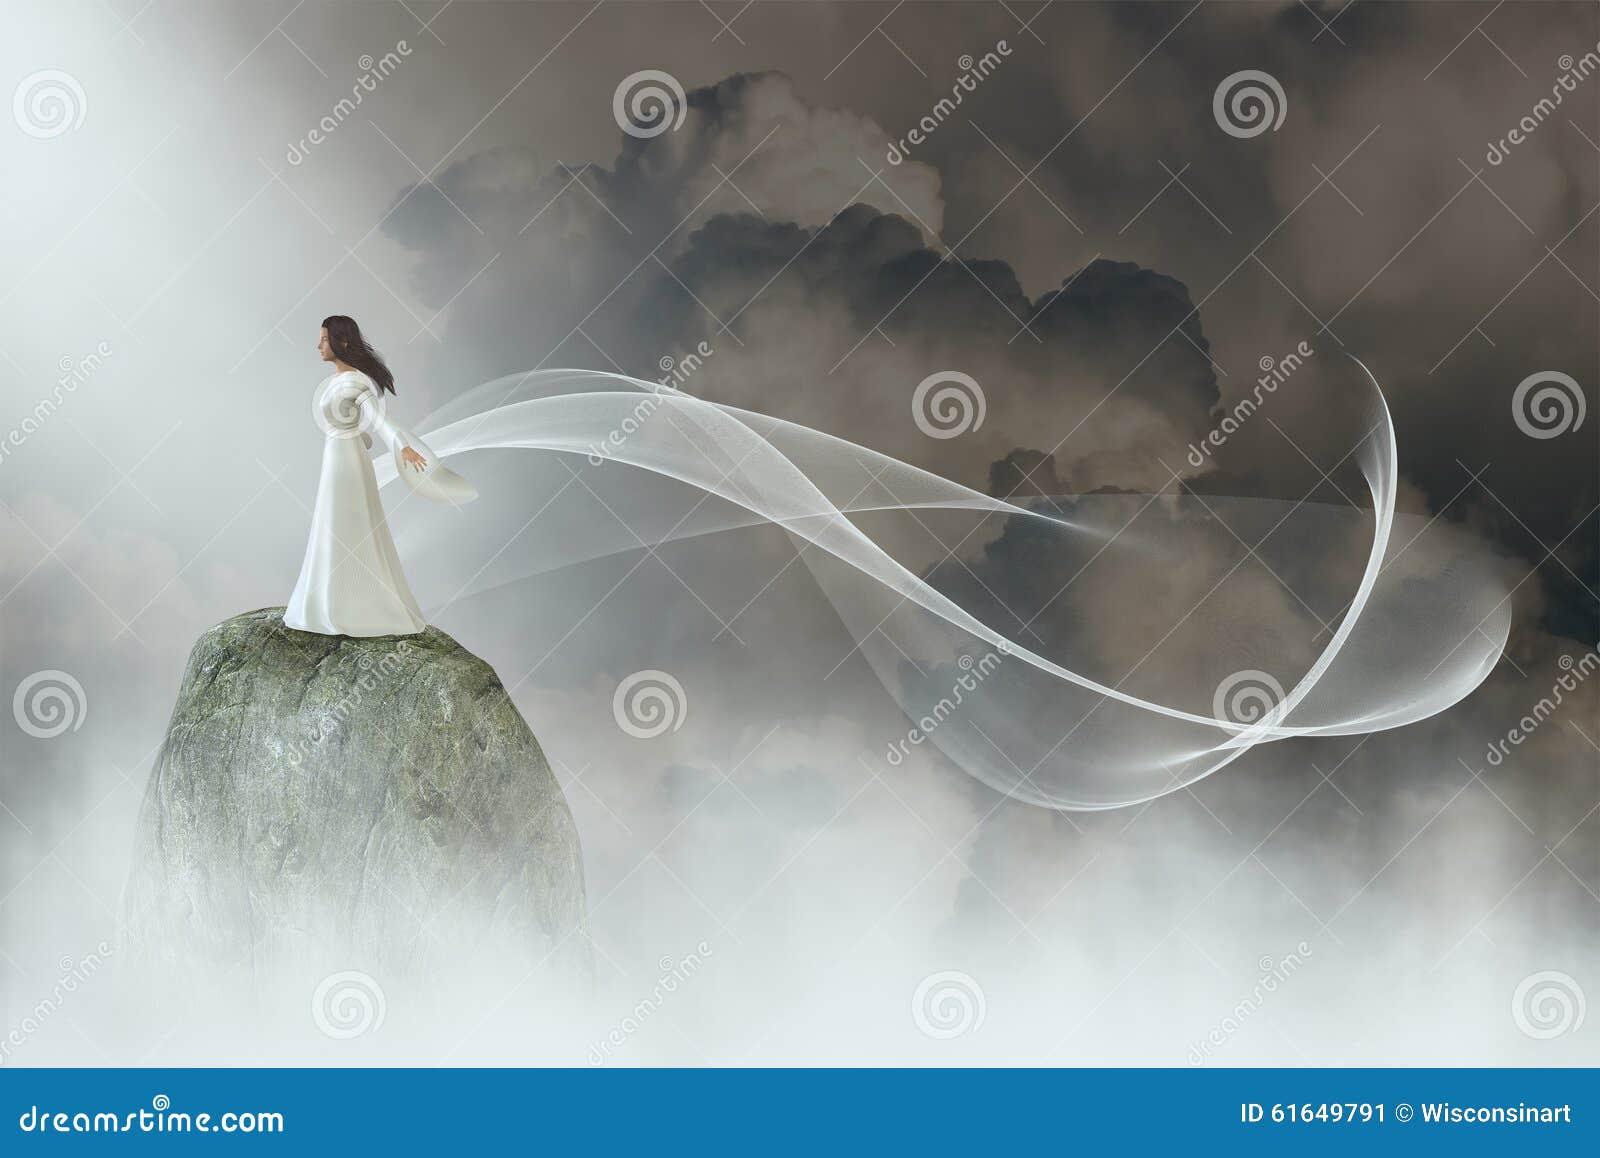 Pokój, nadzieja, natura, piękno, miłość